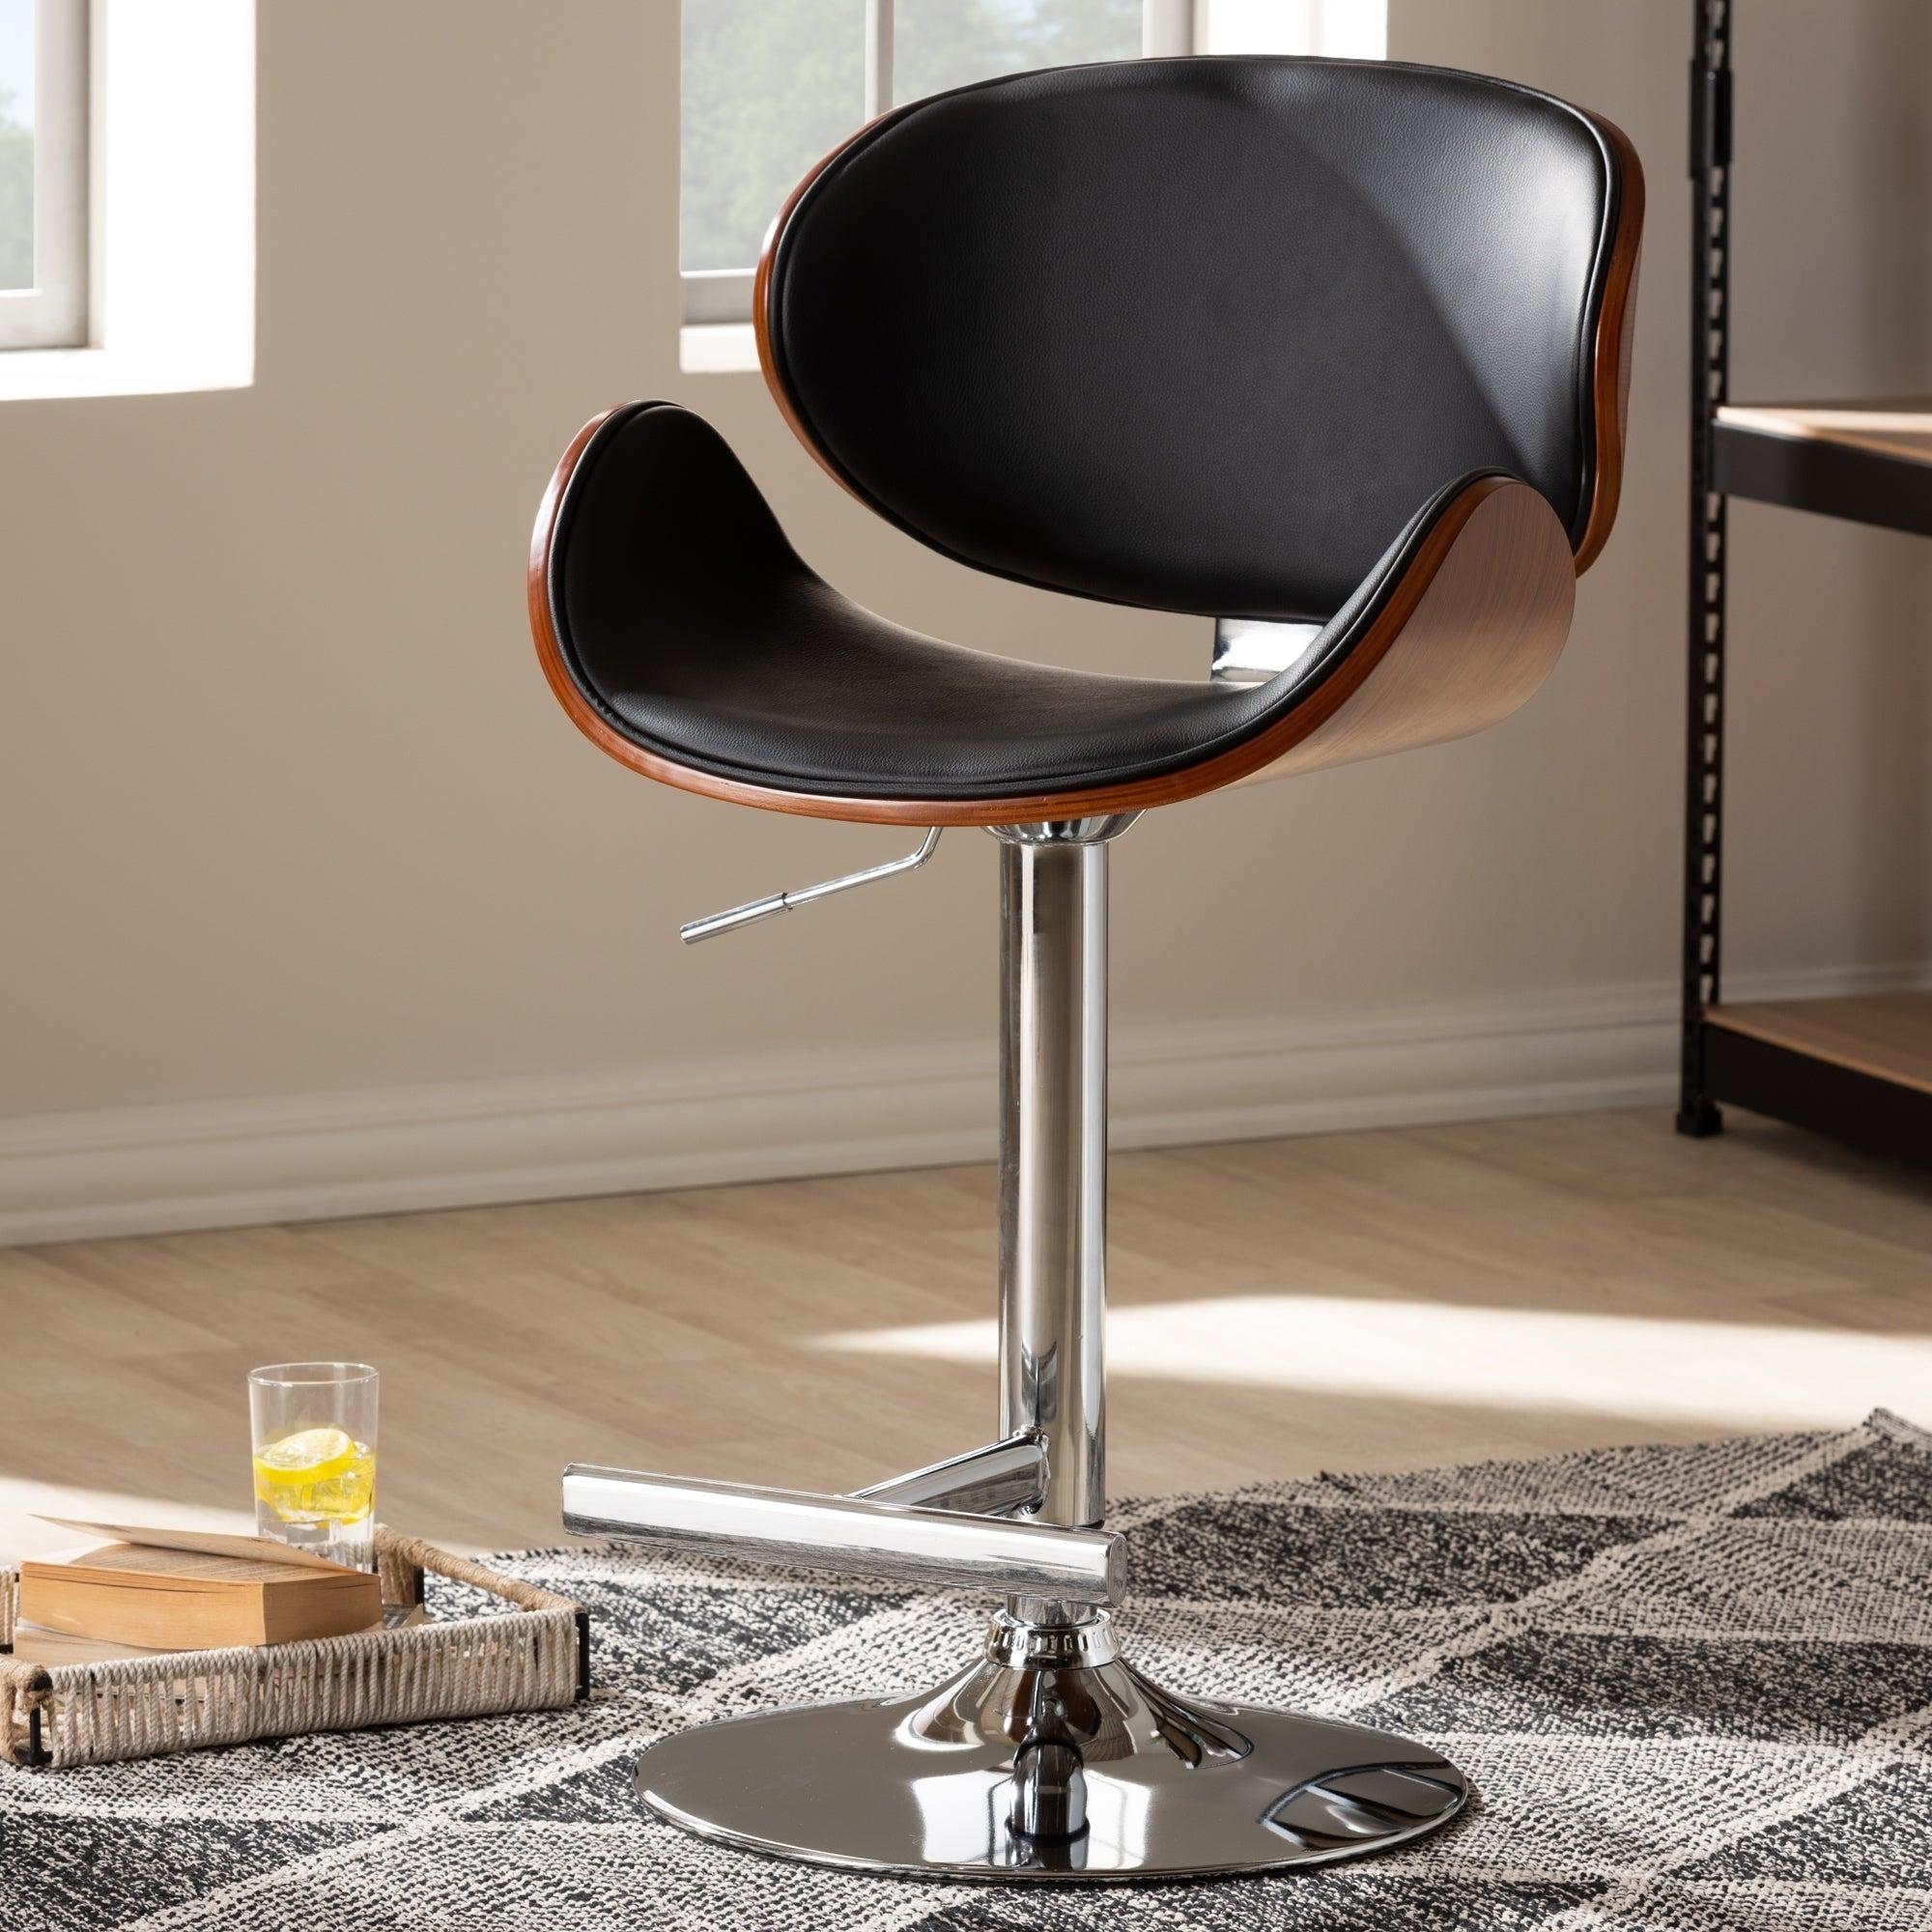 Remarkable Contemporary Black Adjustable Swivel Bar Stool By Baxton Studio Uwap Interior Chair Design Uwaporg